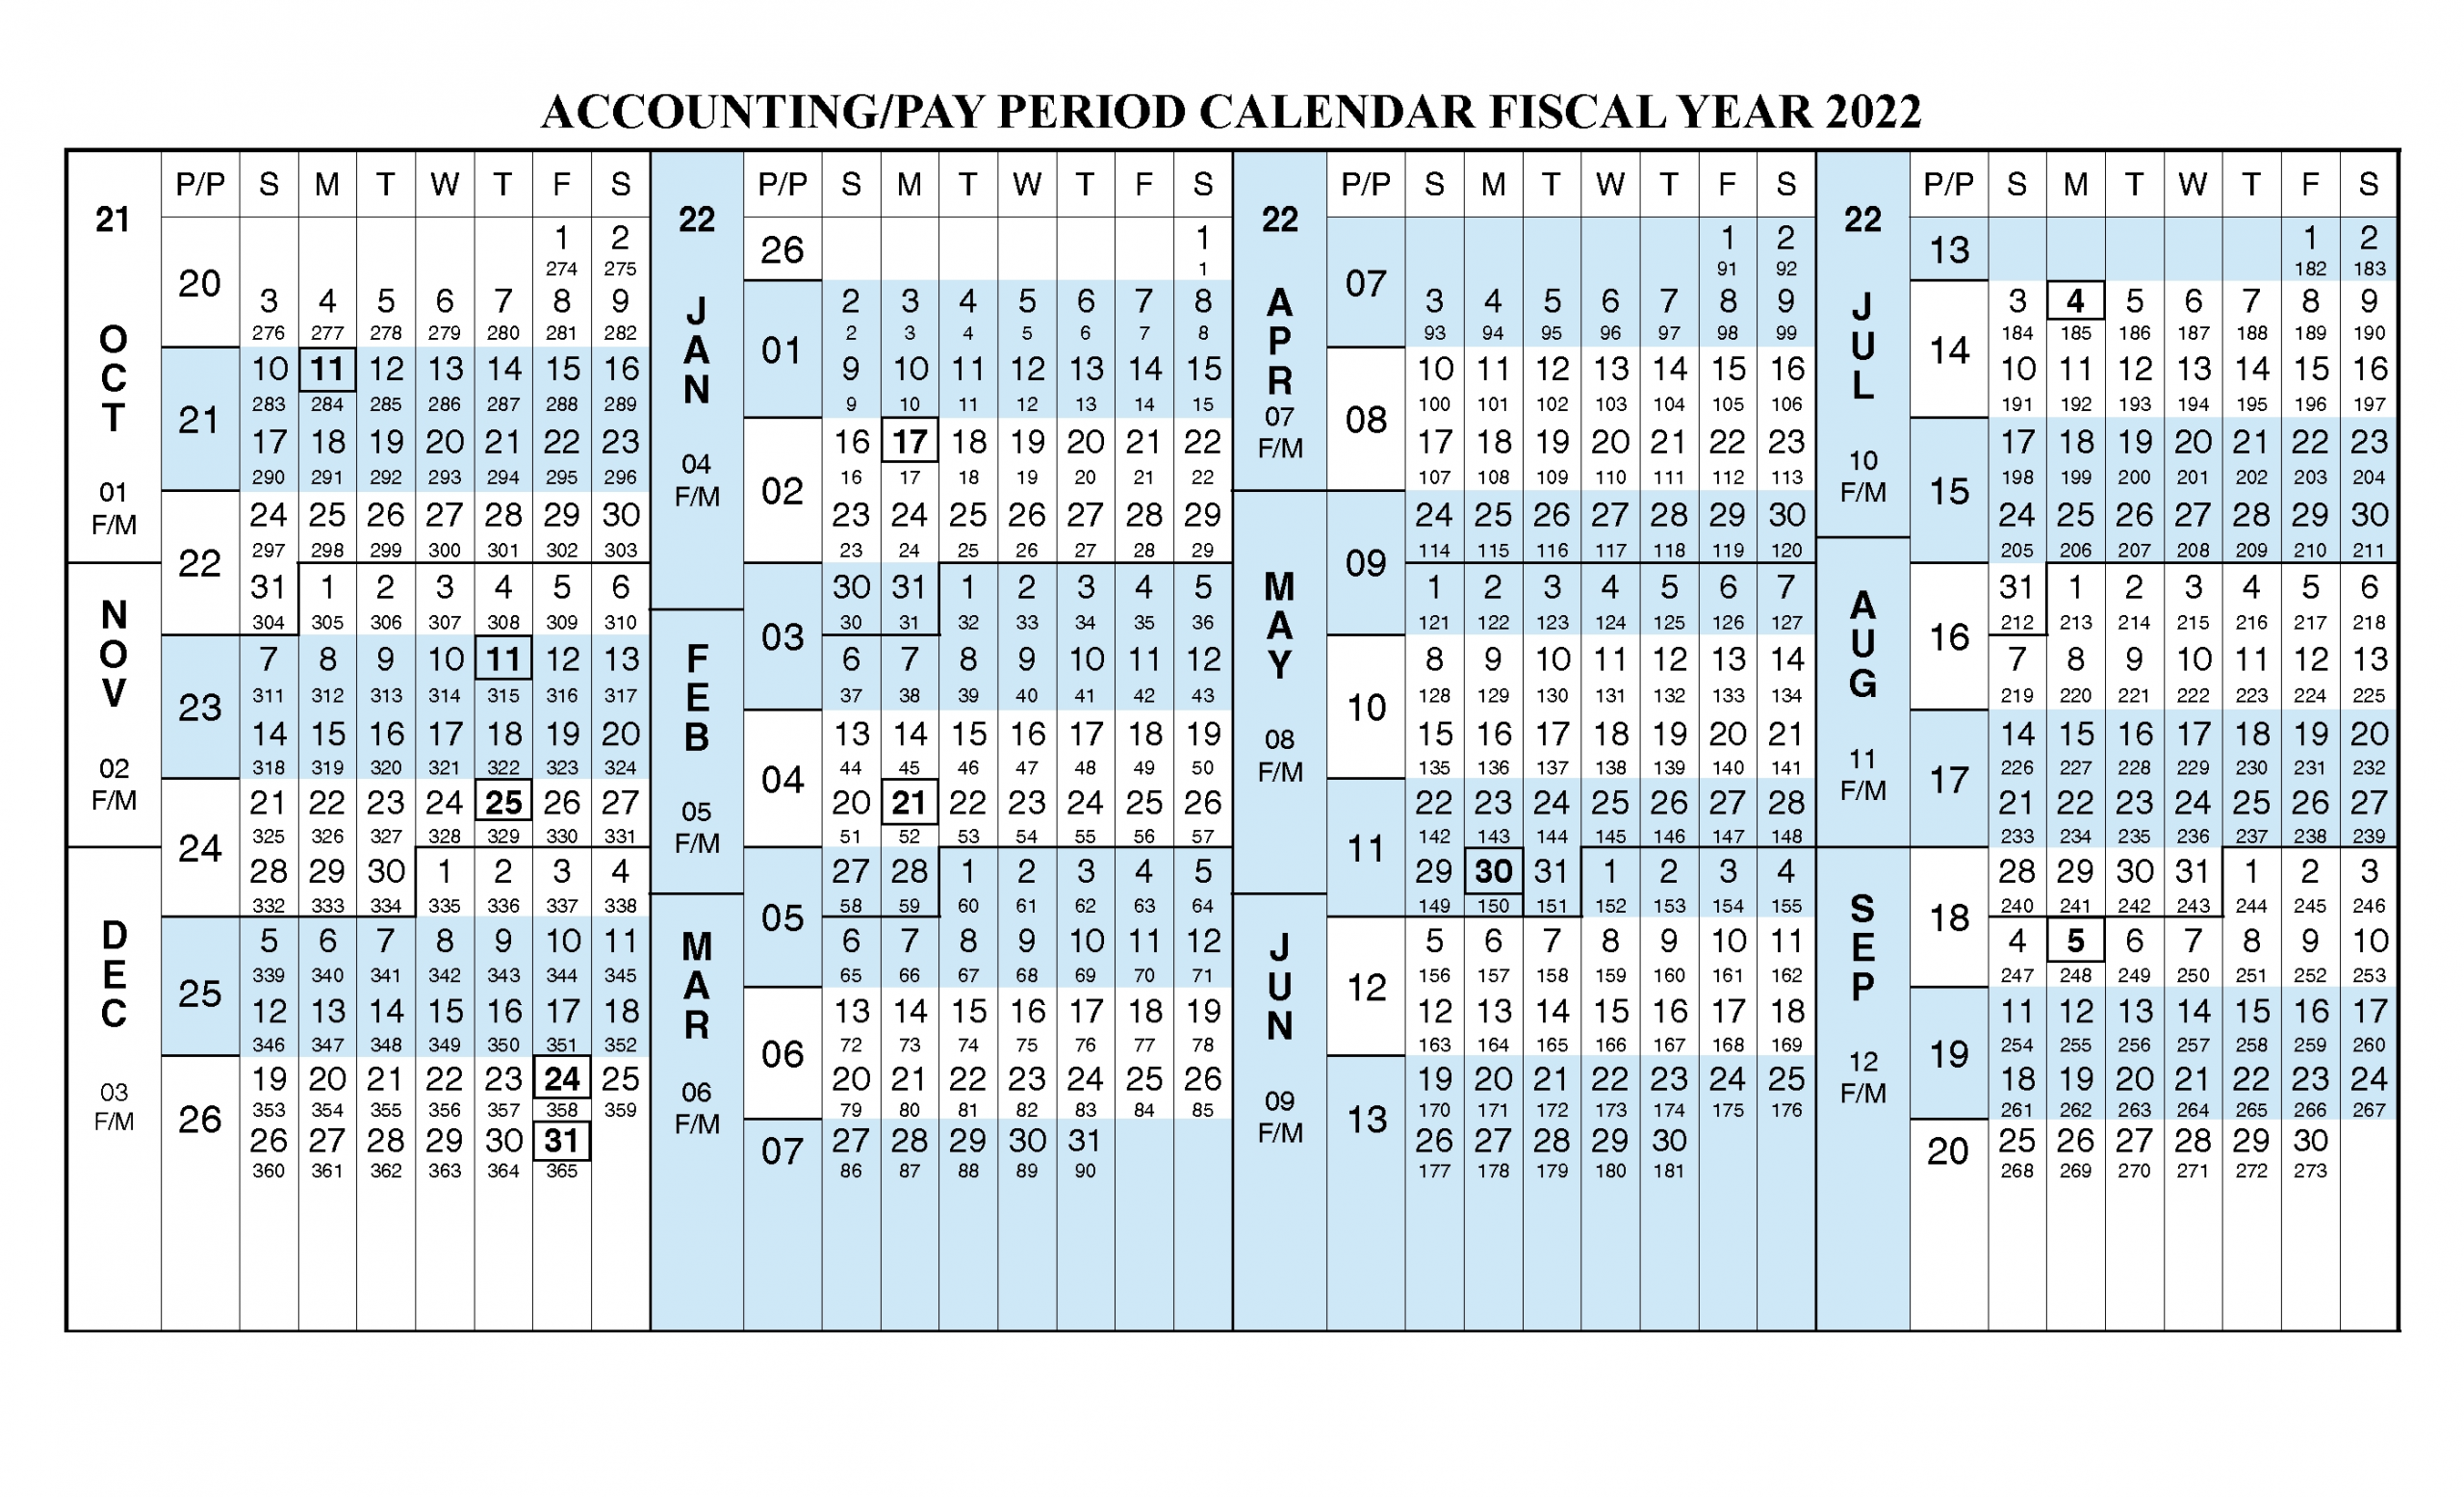 Payroll Calendar 2022 Fiscal Year Calendar [ Oct 2021 - Sep 2022 ] | Free Printable 2020